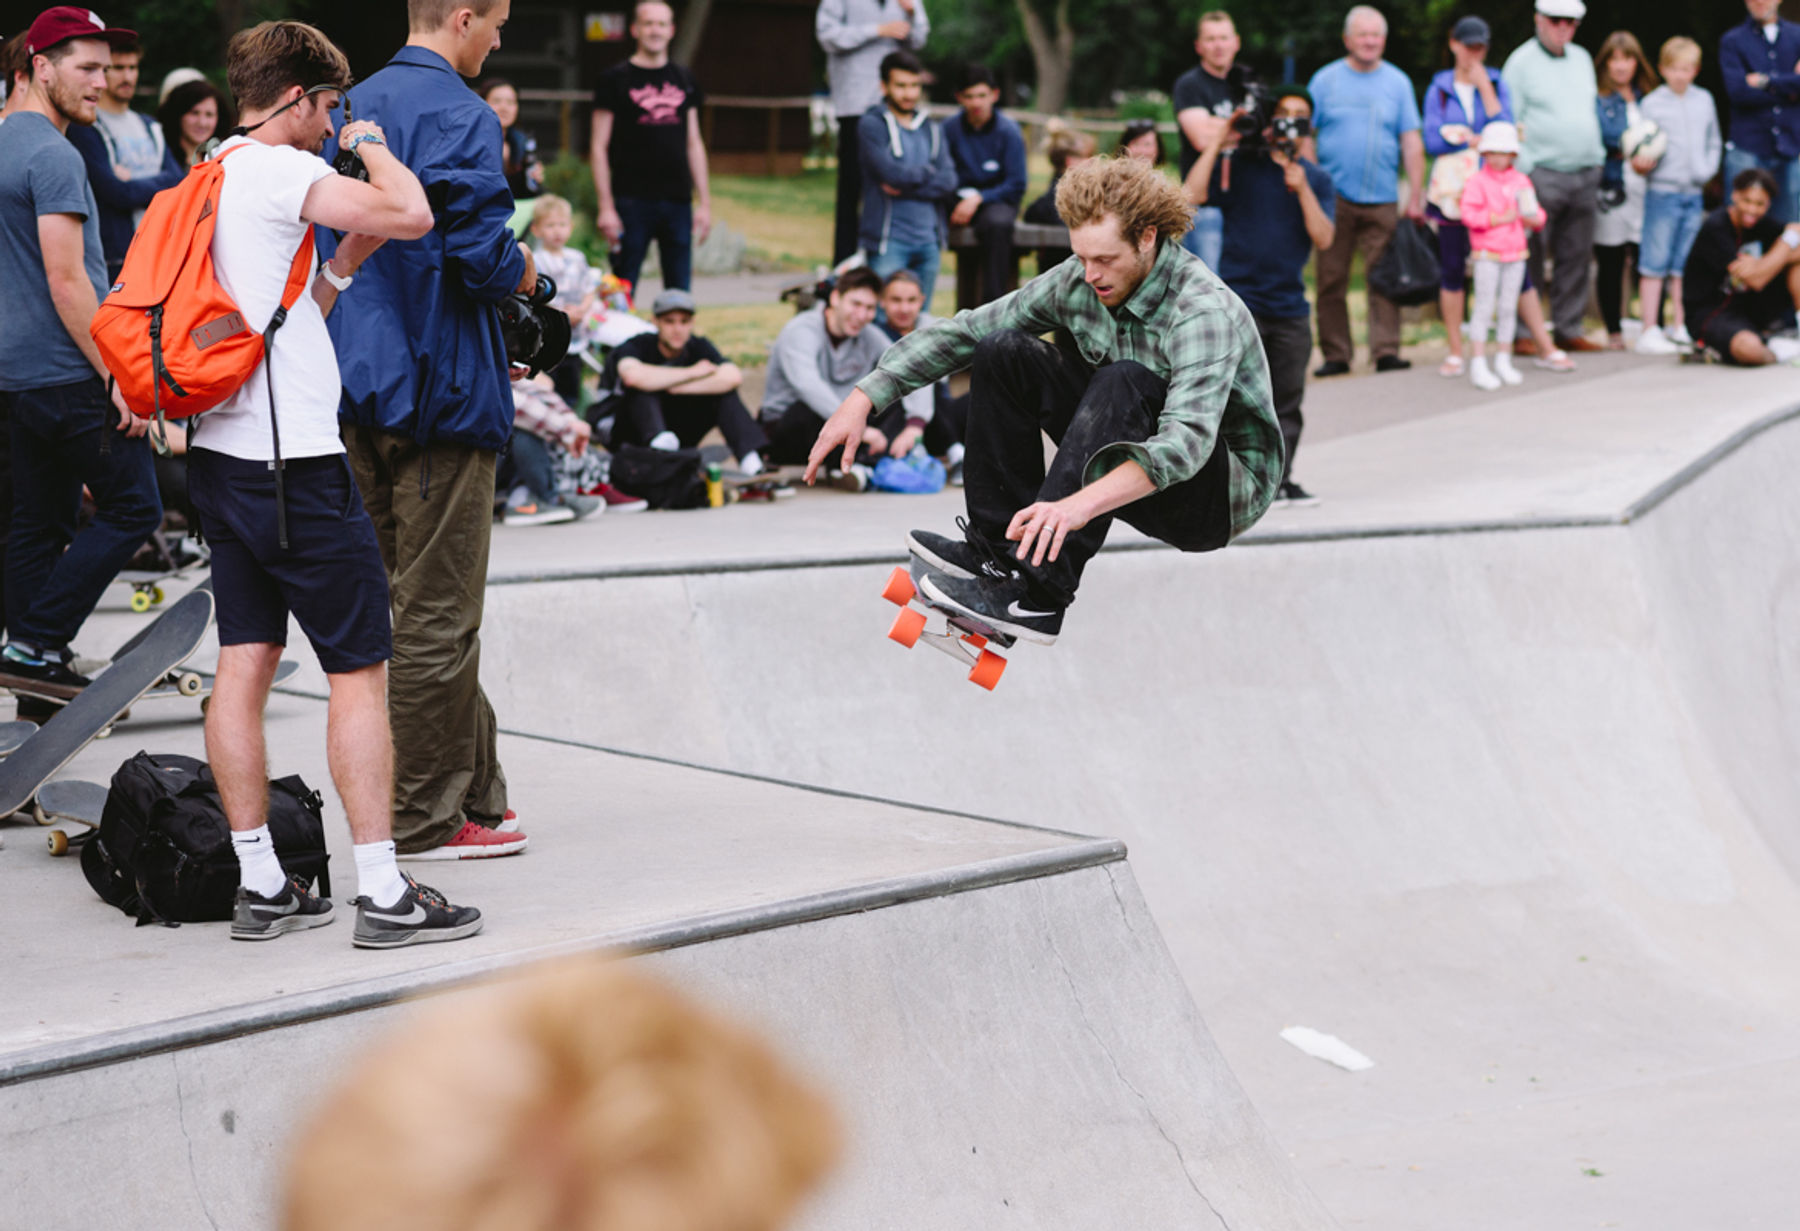 _IHC8088e-Willis-Kimbel-Ollie-Nike-SB-x-Slam-City-Skates-Go-Skateboarding-Day-London-June-2015-Photographer-Maksim-Kalanep